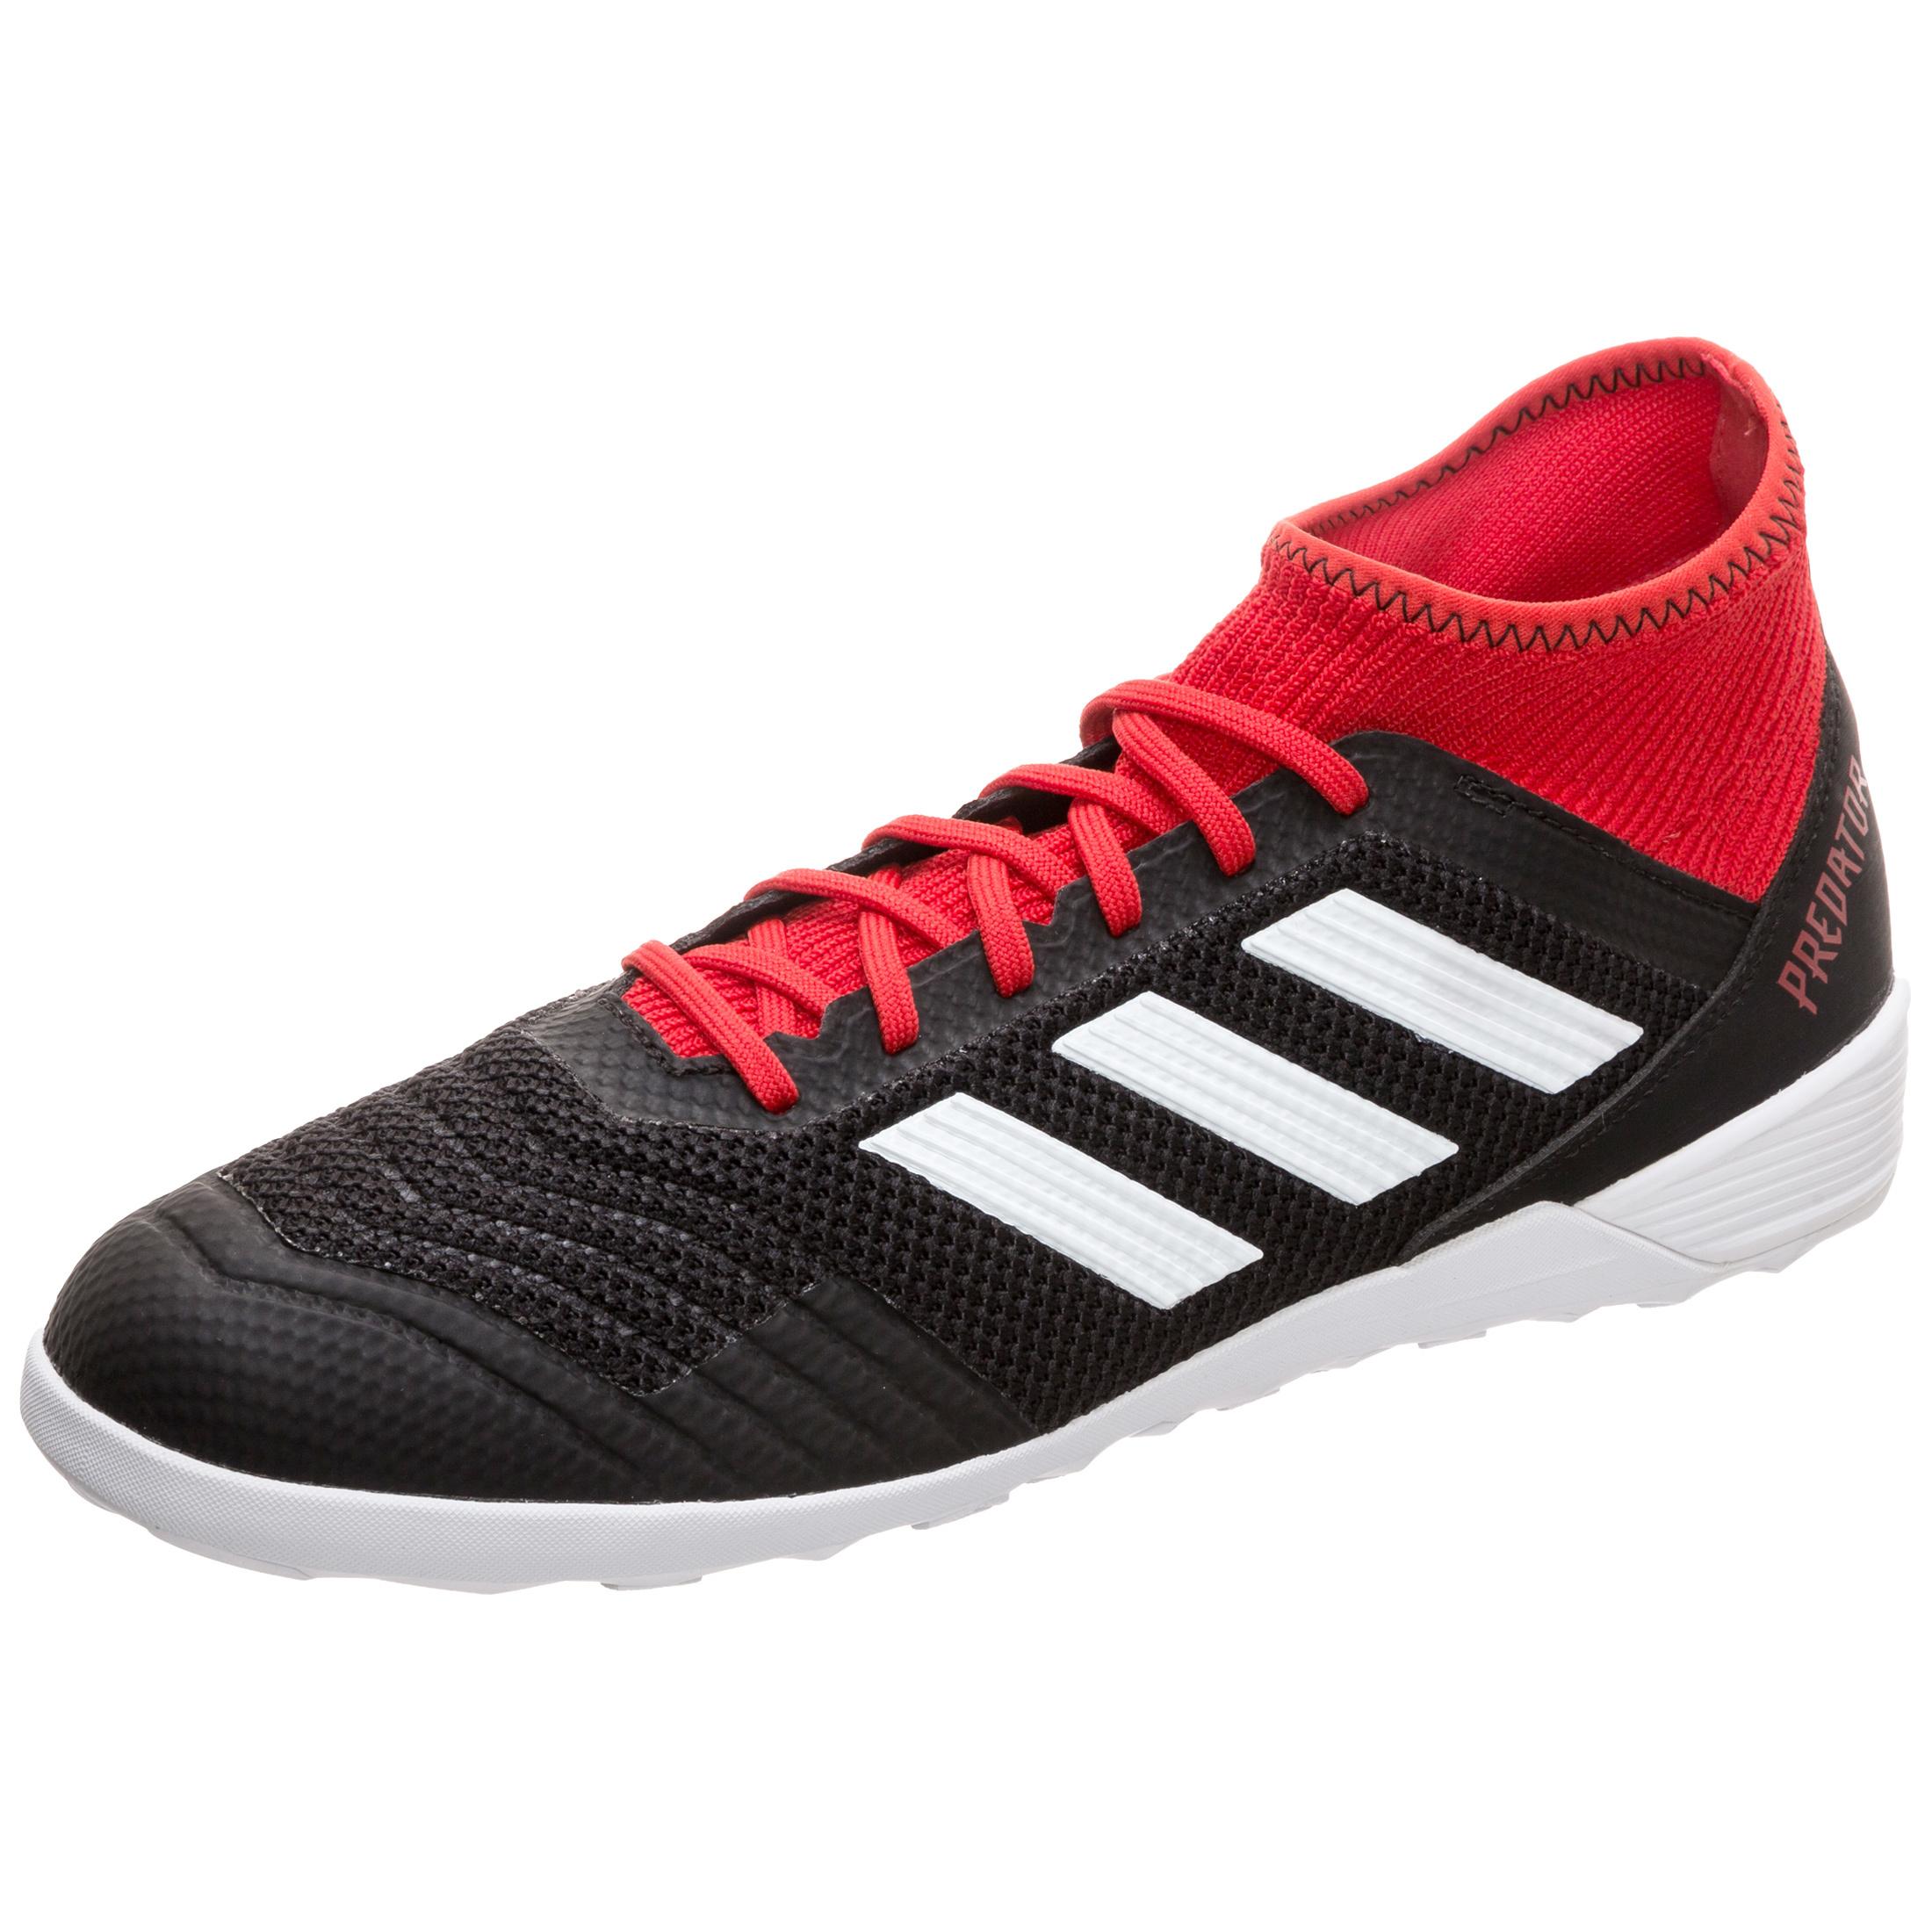 adidas Predator Tango 18.3 Indoor Boots